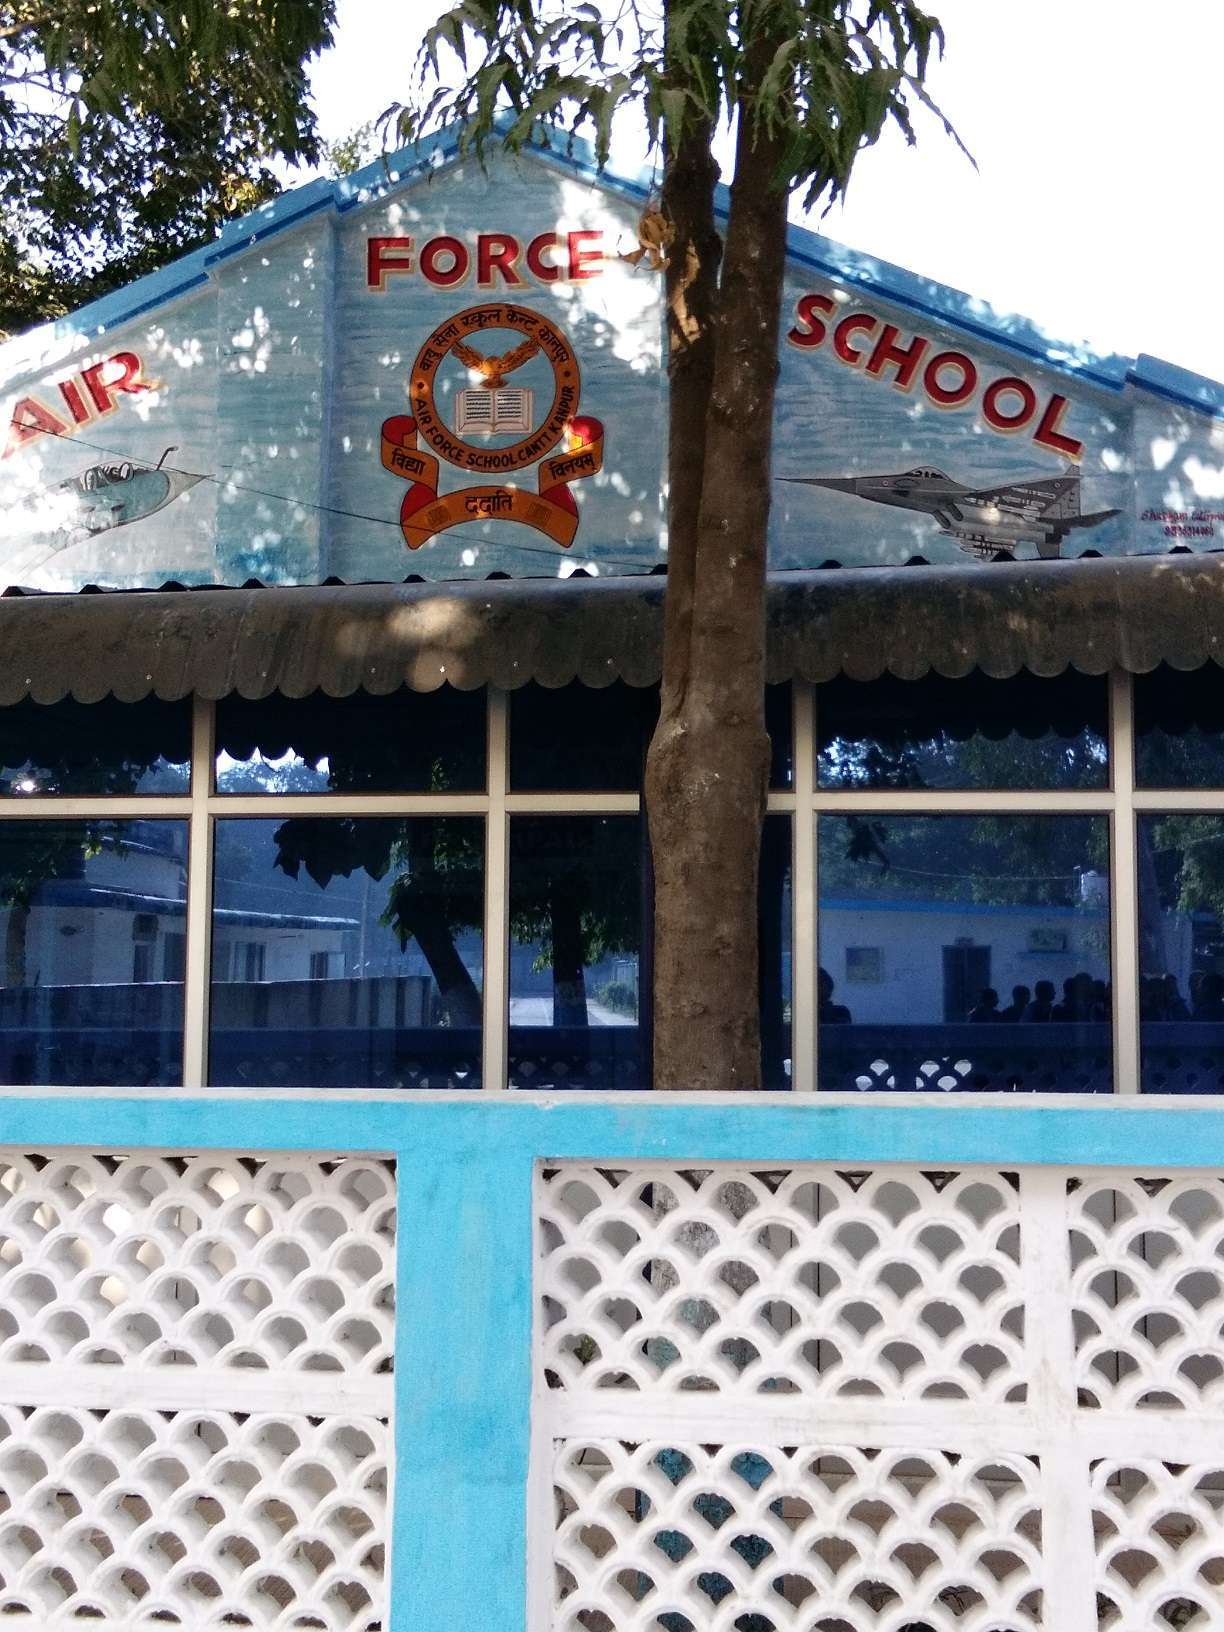 AIR FORCE SCHOOL NO 7 A F HOSPITAL KANPUR CANTT UTTAR PRADESH 2130264